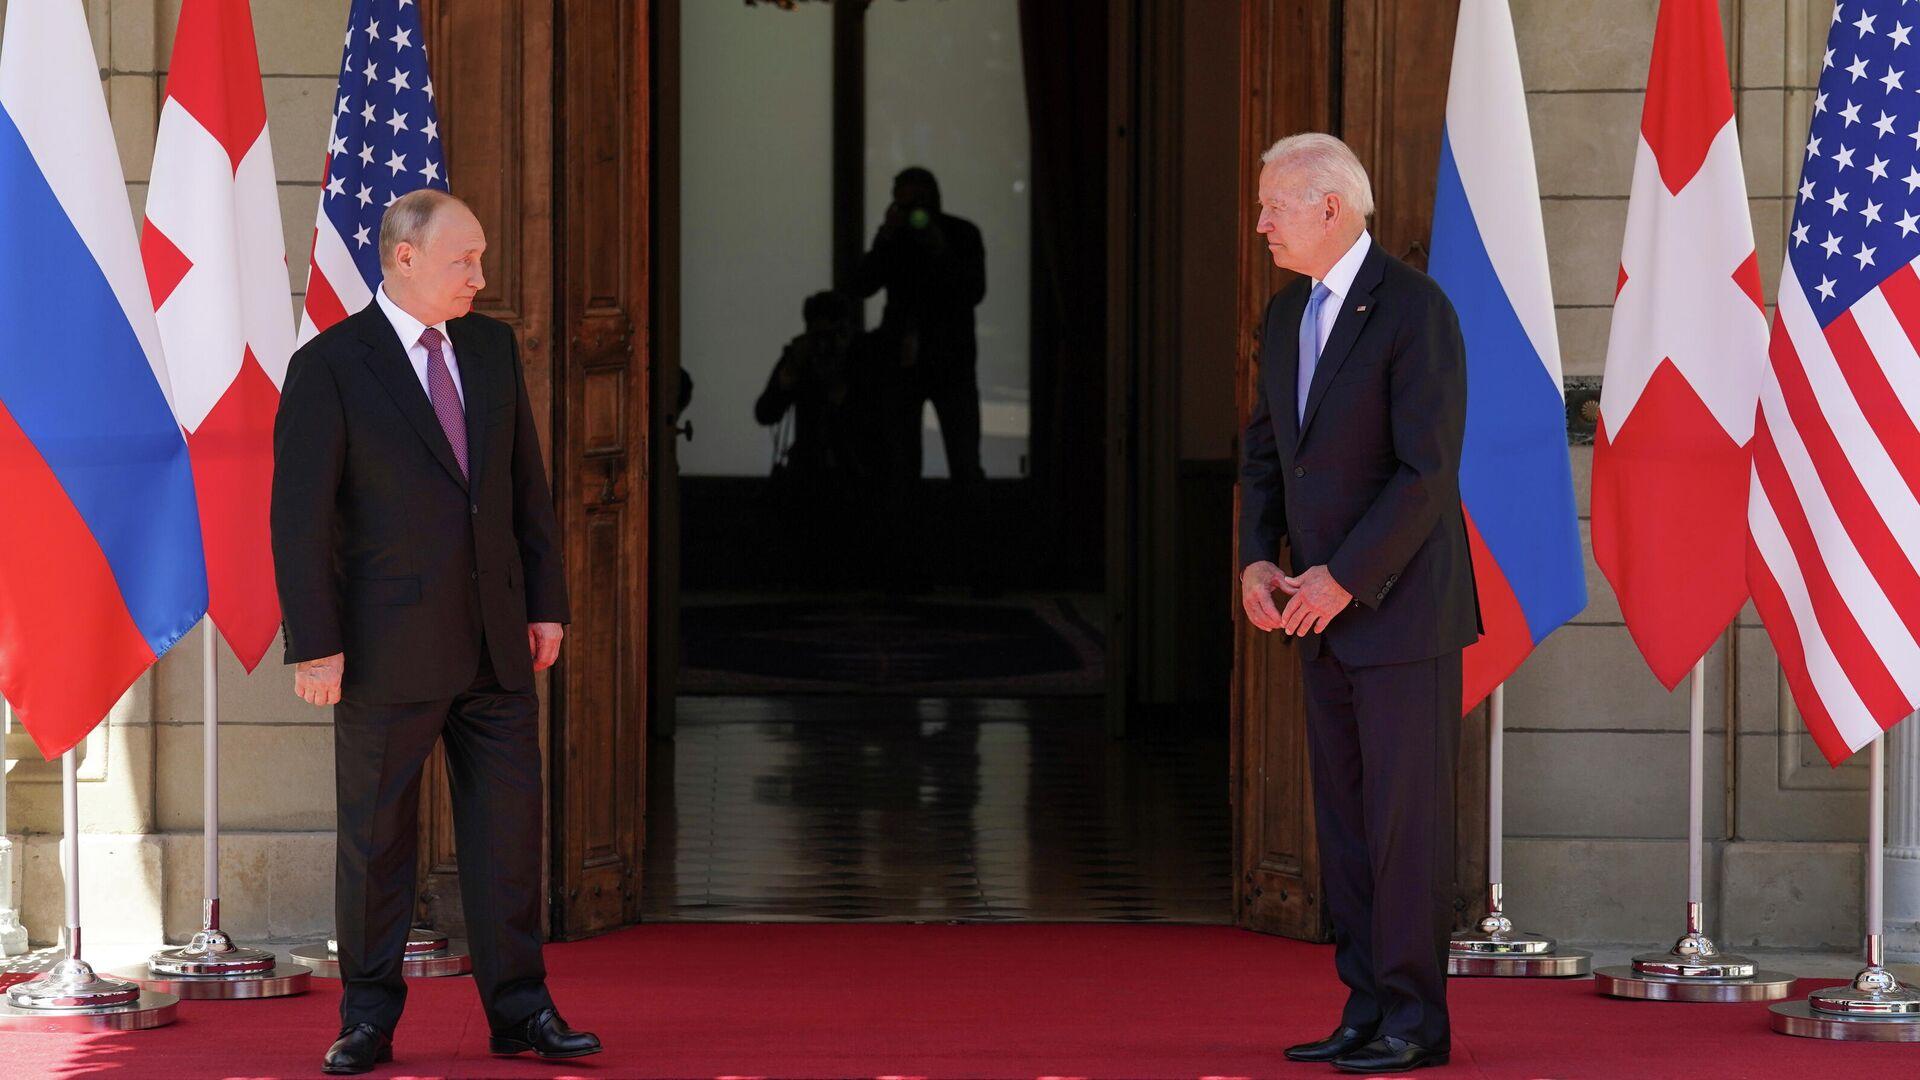 Президент РФ Владимир Путин и президент США Джо Байден во время встречи на вилле Ла Гранж в Женеве - РИА Новости, 1920, 17.06.2021